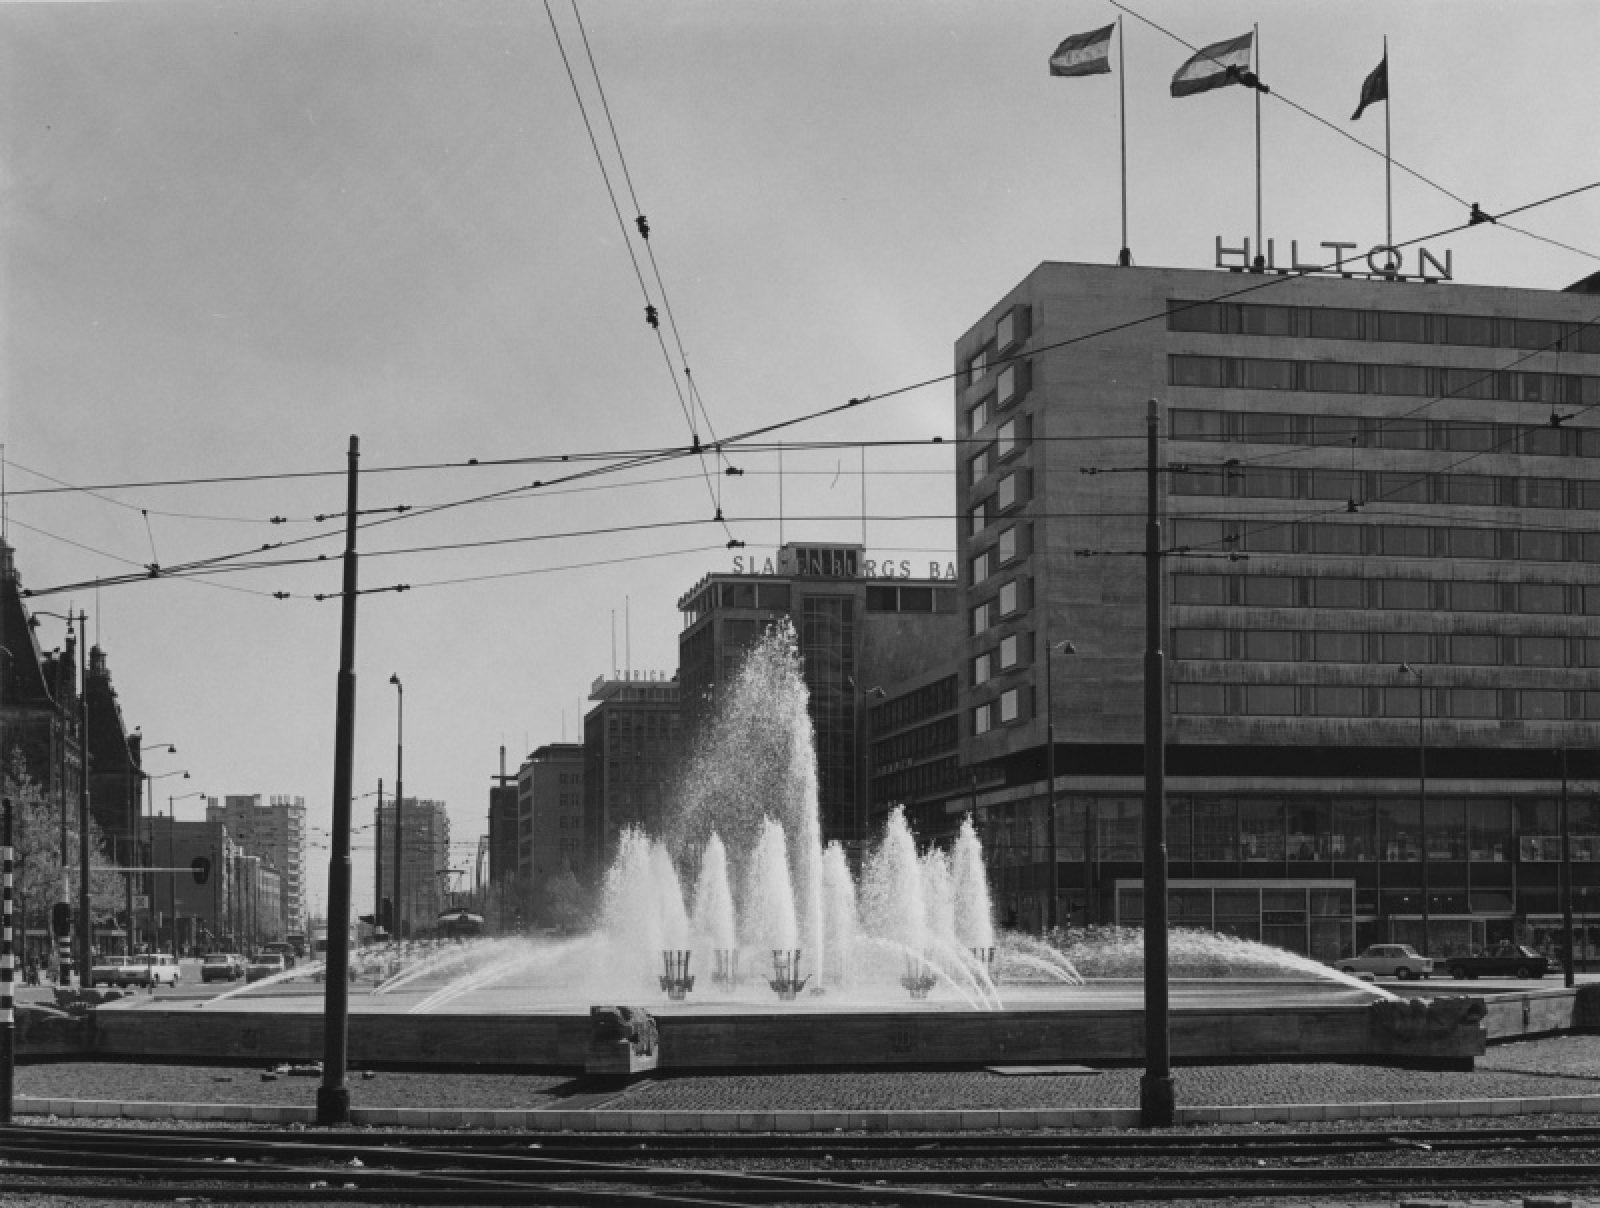 1971 hofplein TD NL Rt SA 4202 1971 1207 01